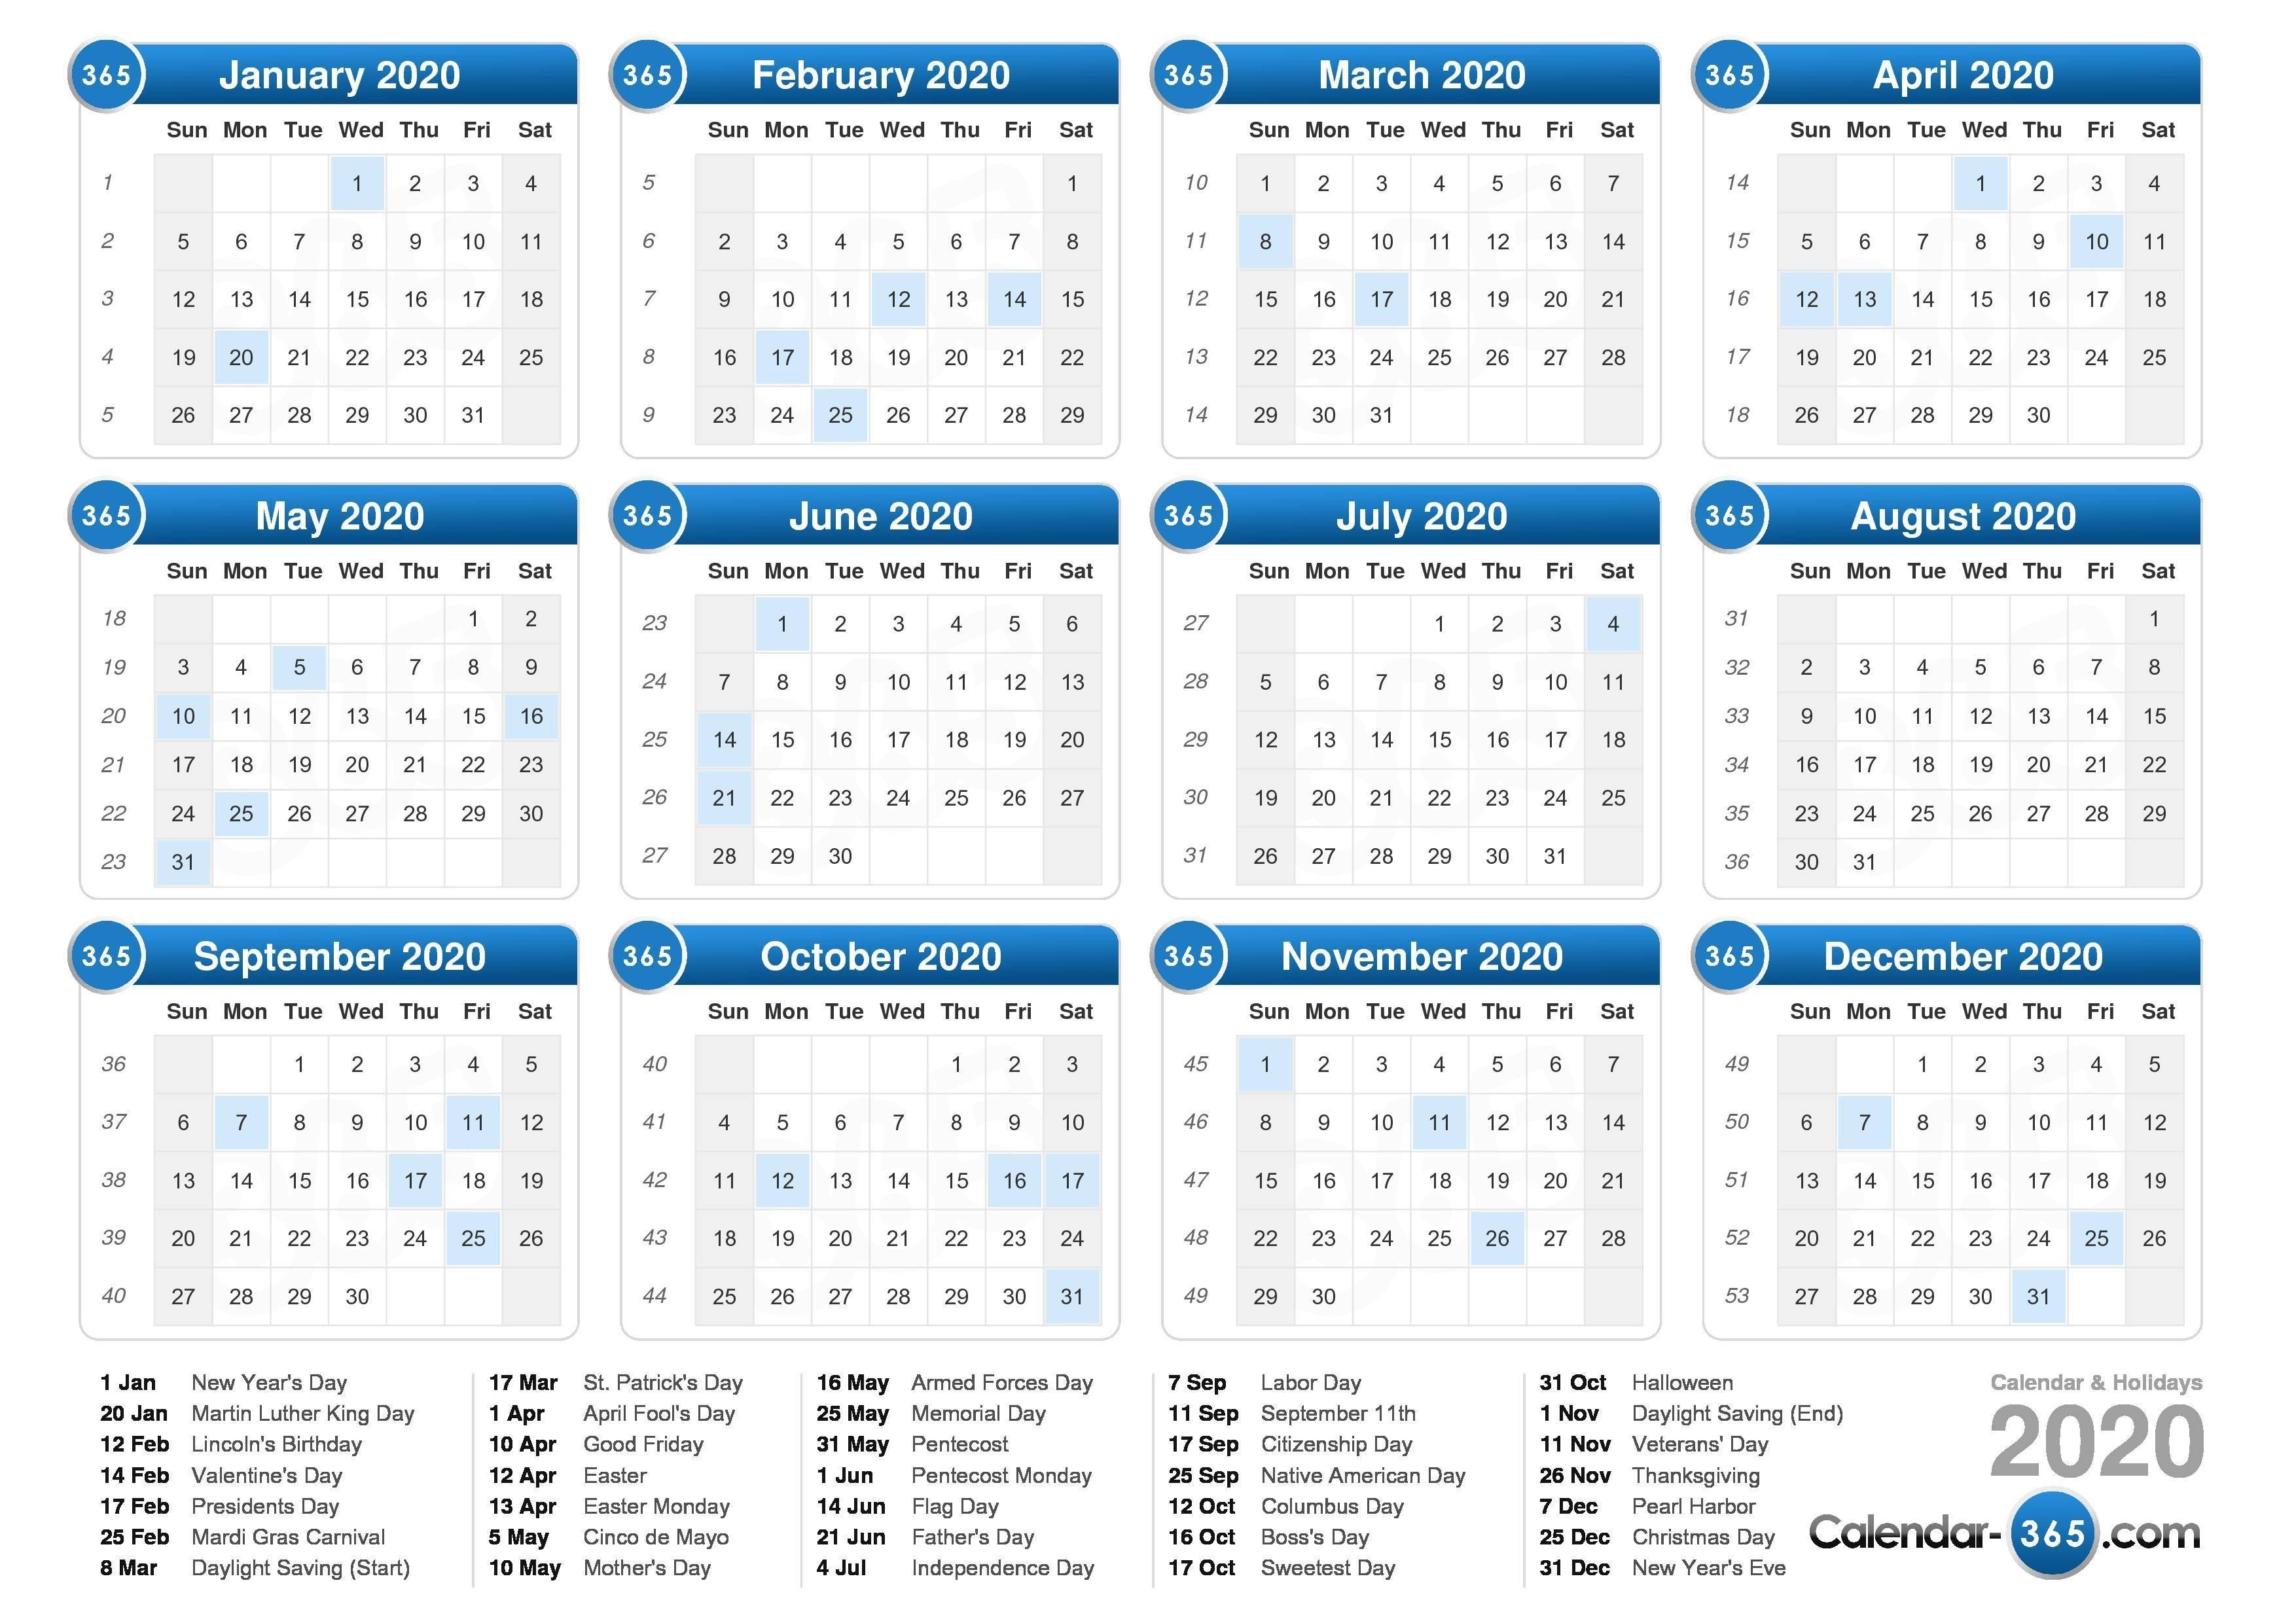 2020 Calendar-2020 South Africa Calendar And Holidays